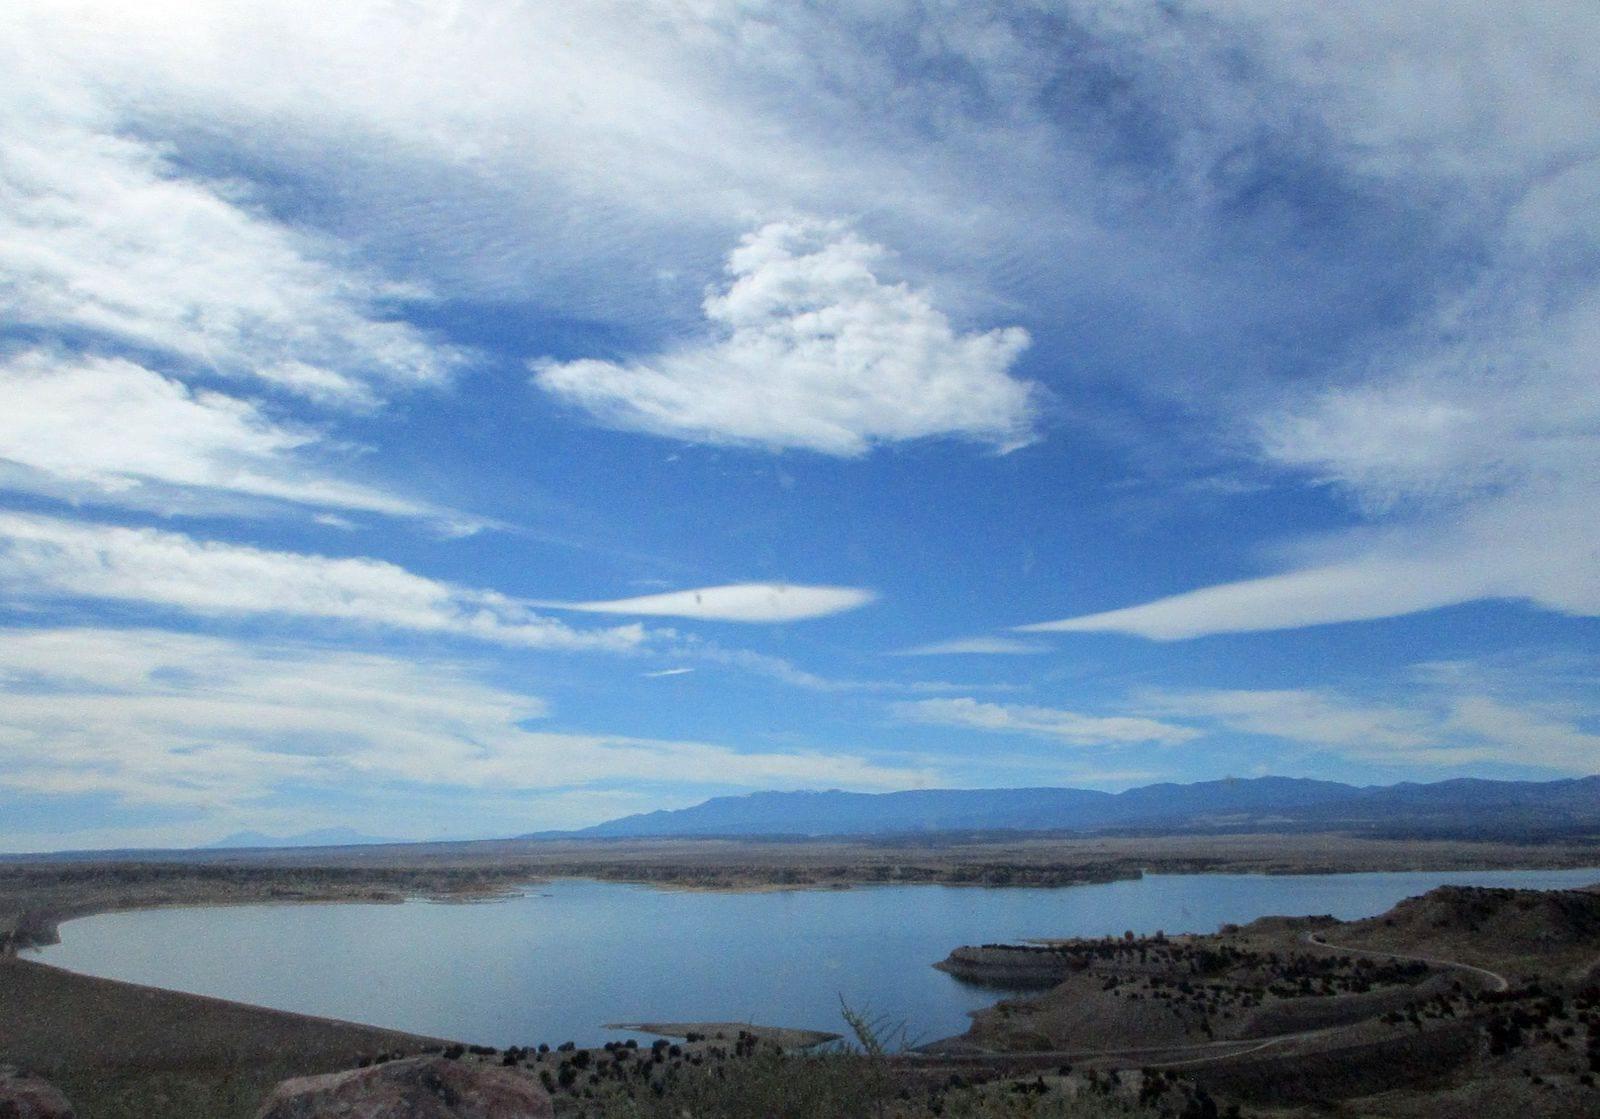 Overlooking Lake Pueblo State Park